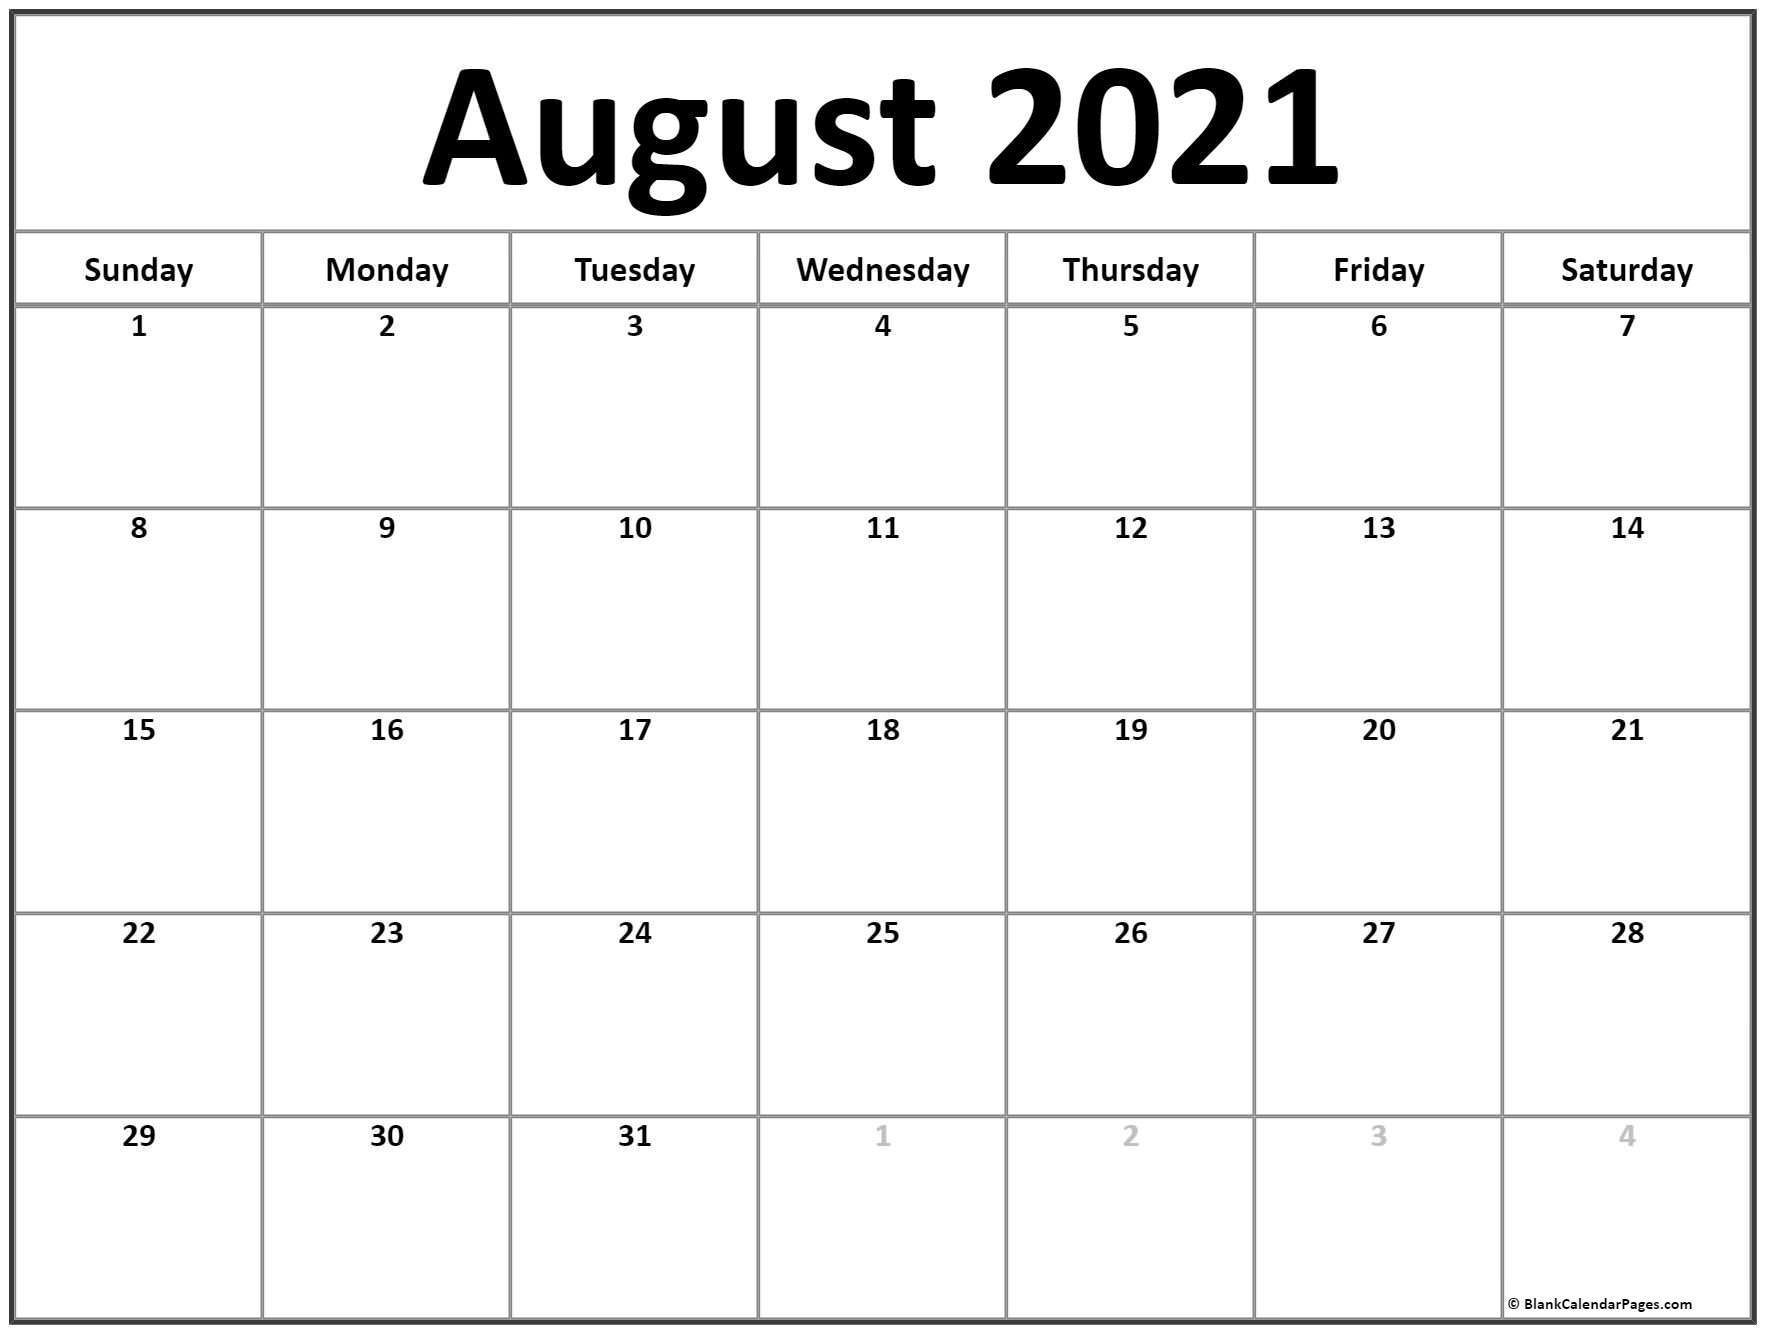 August 2021 Calendar | Free Printable Calendar August 2021 Calendar With Holidays Usa